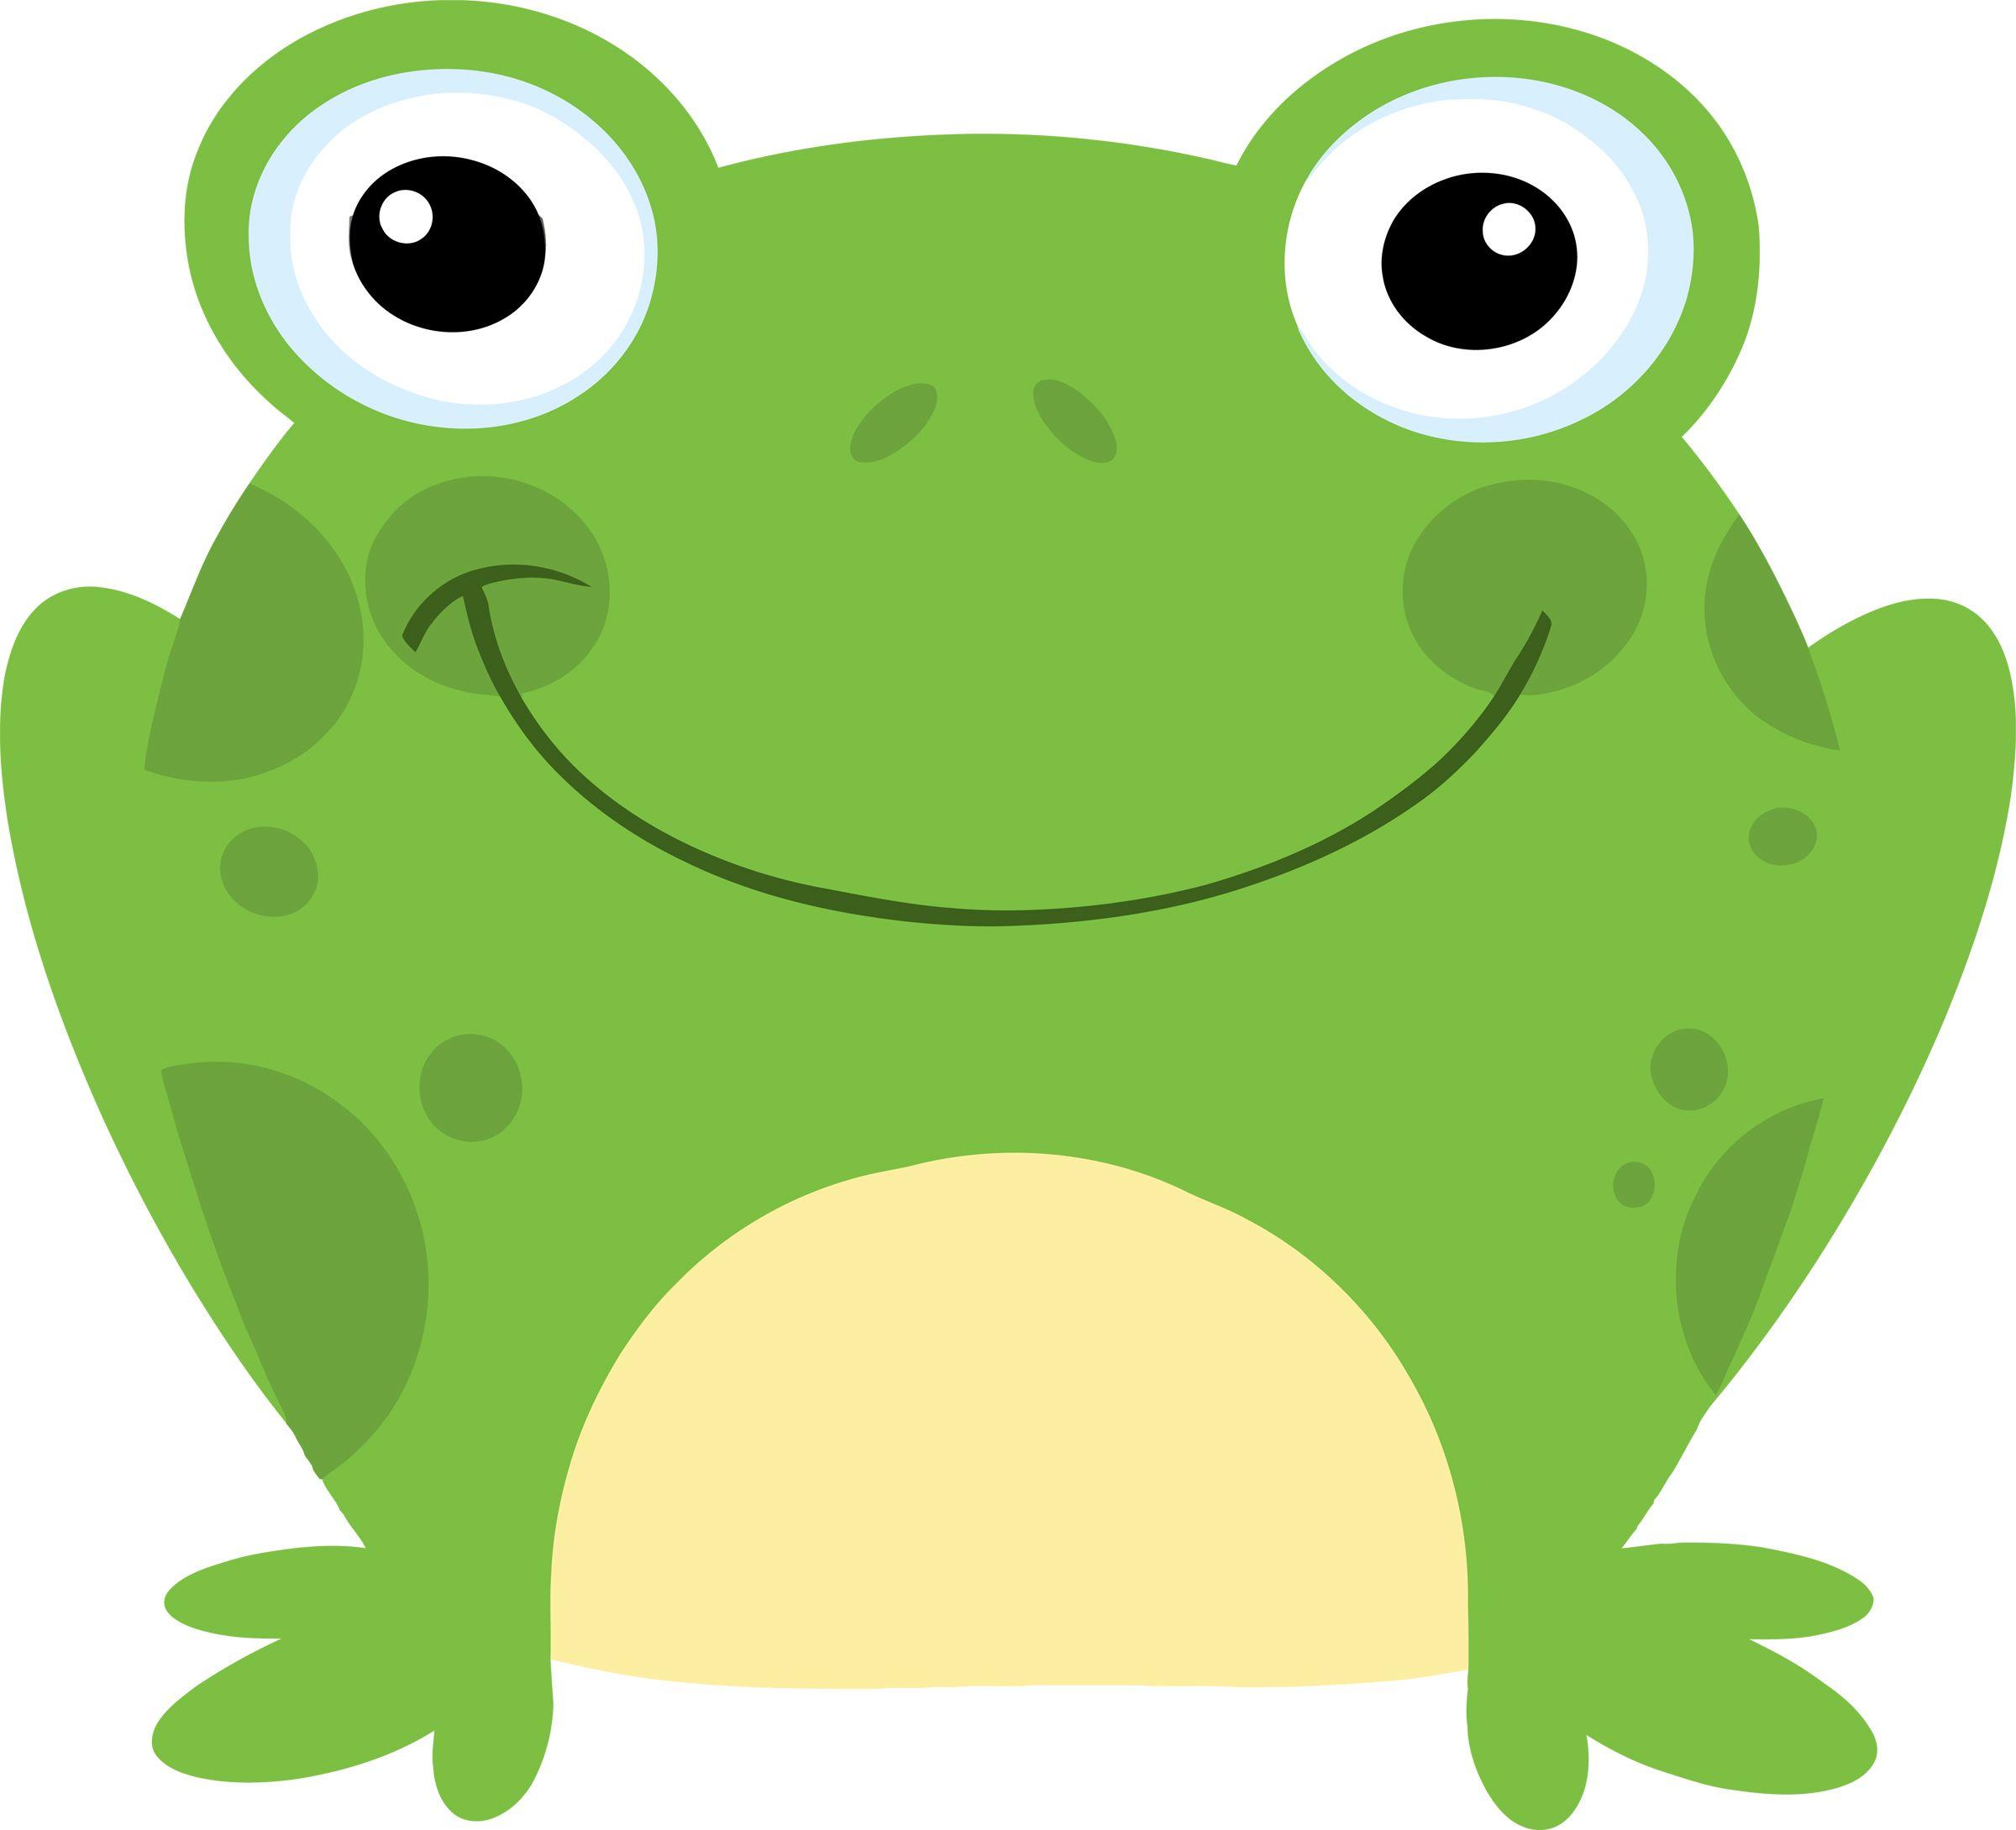 Preschool school illustration happy. Toad clipart small frog